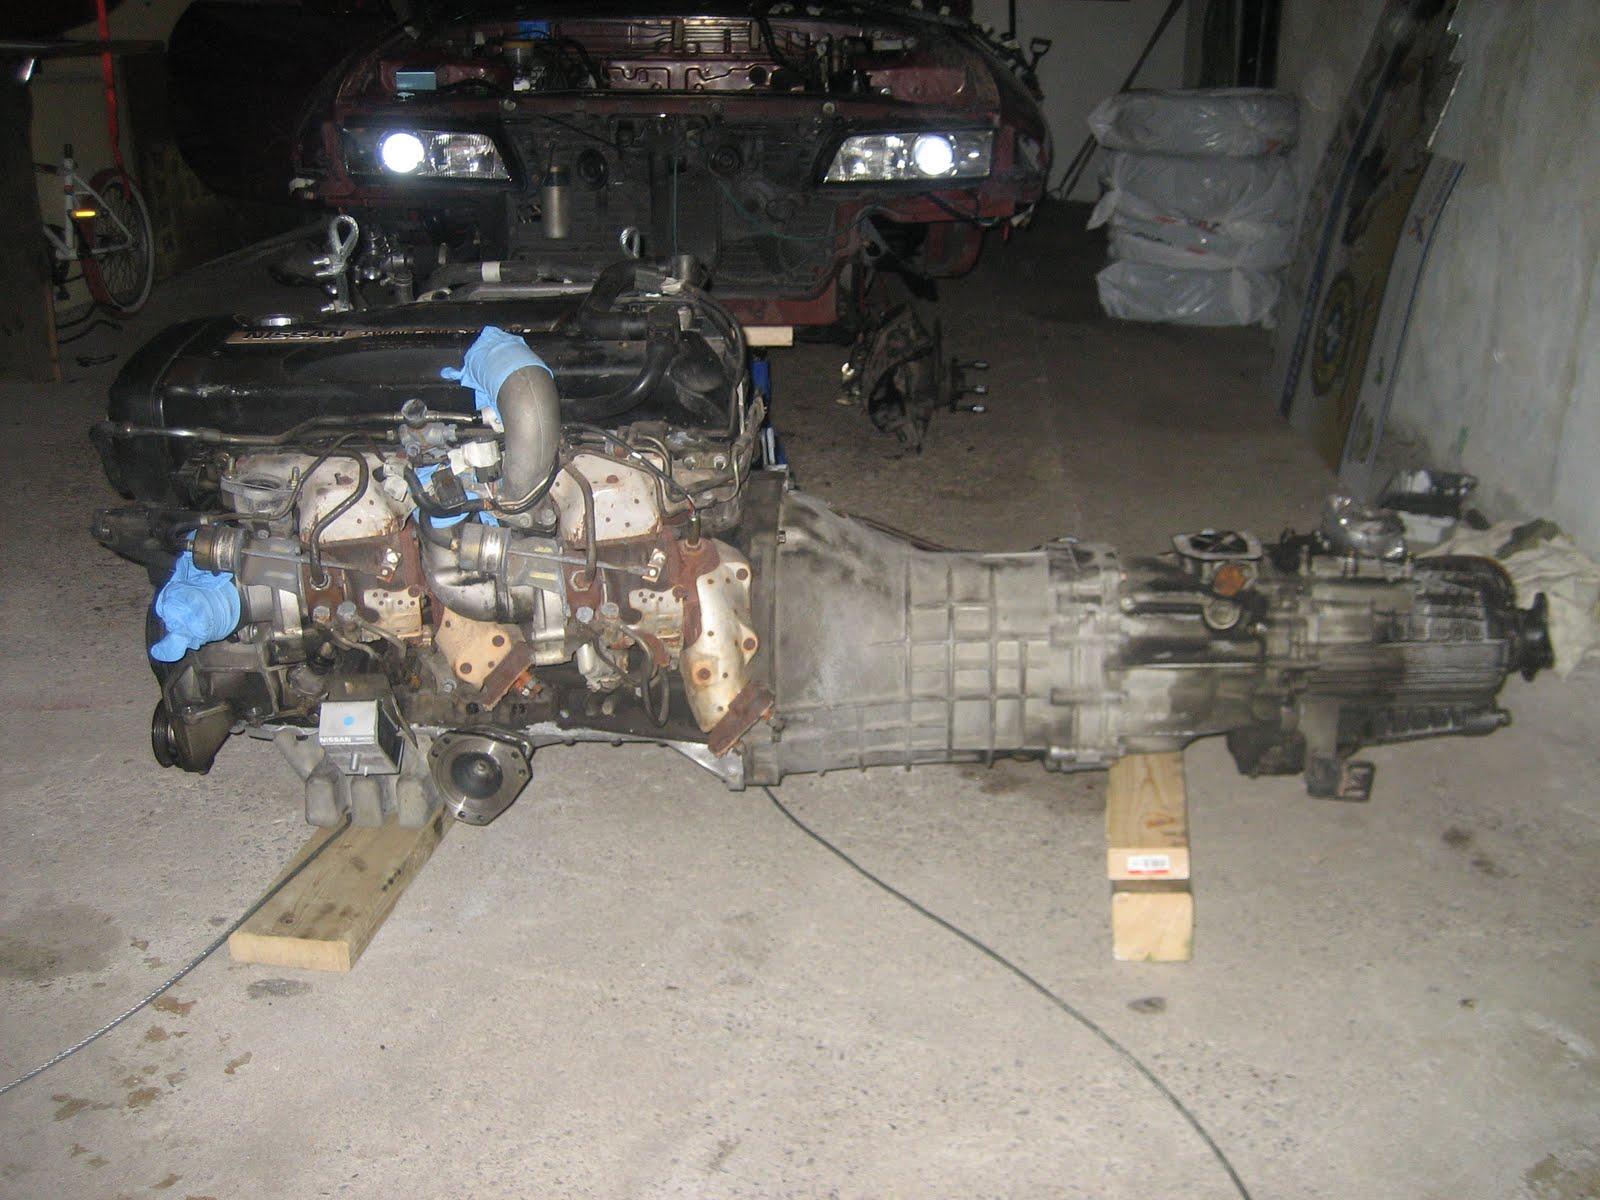 rb26 engine turbo swap upgrade and engine overhaul guide rh skylife4ever com RB26 Twin Turbo Engine RB26 vs 2JZ-GTE